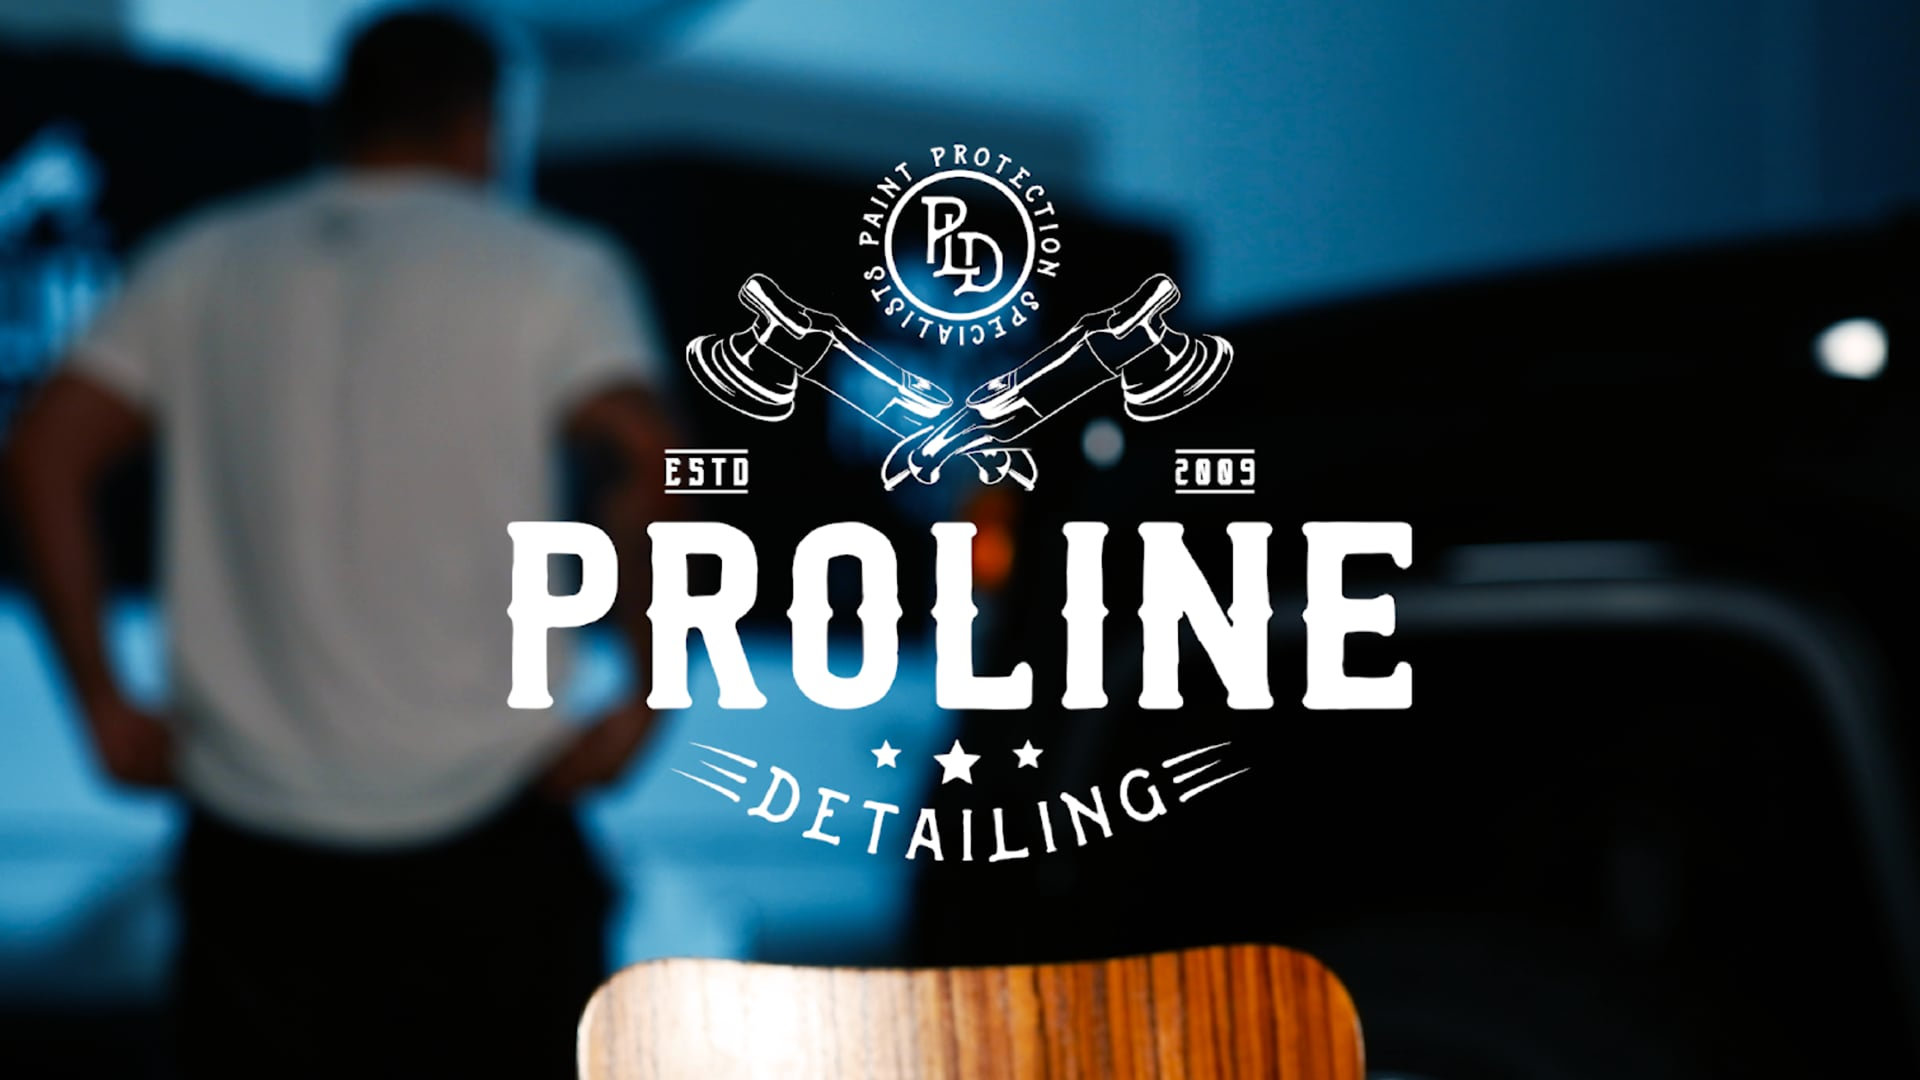 Proline Detail